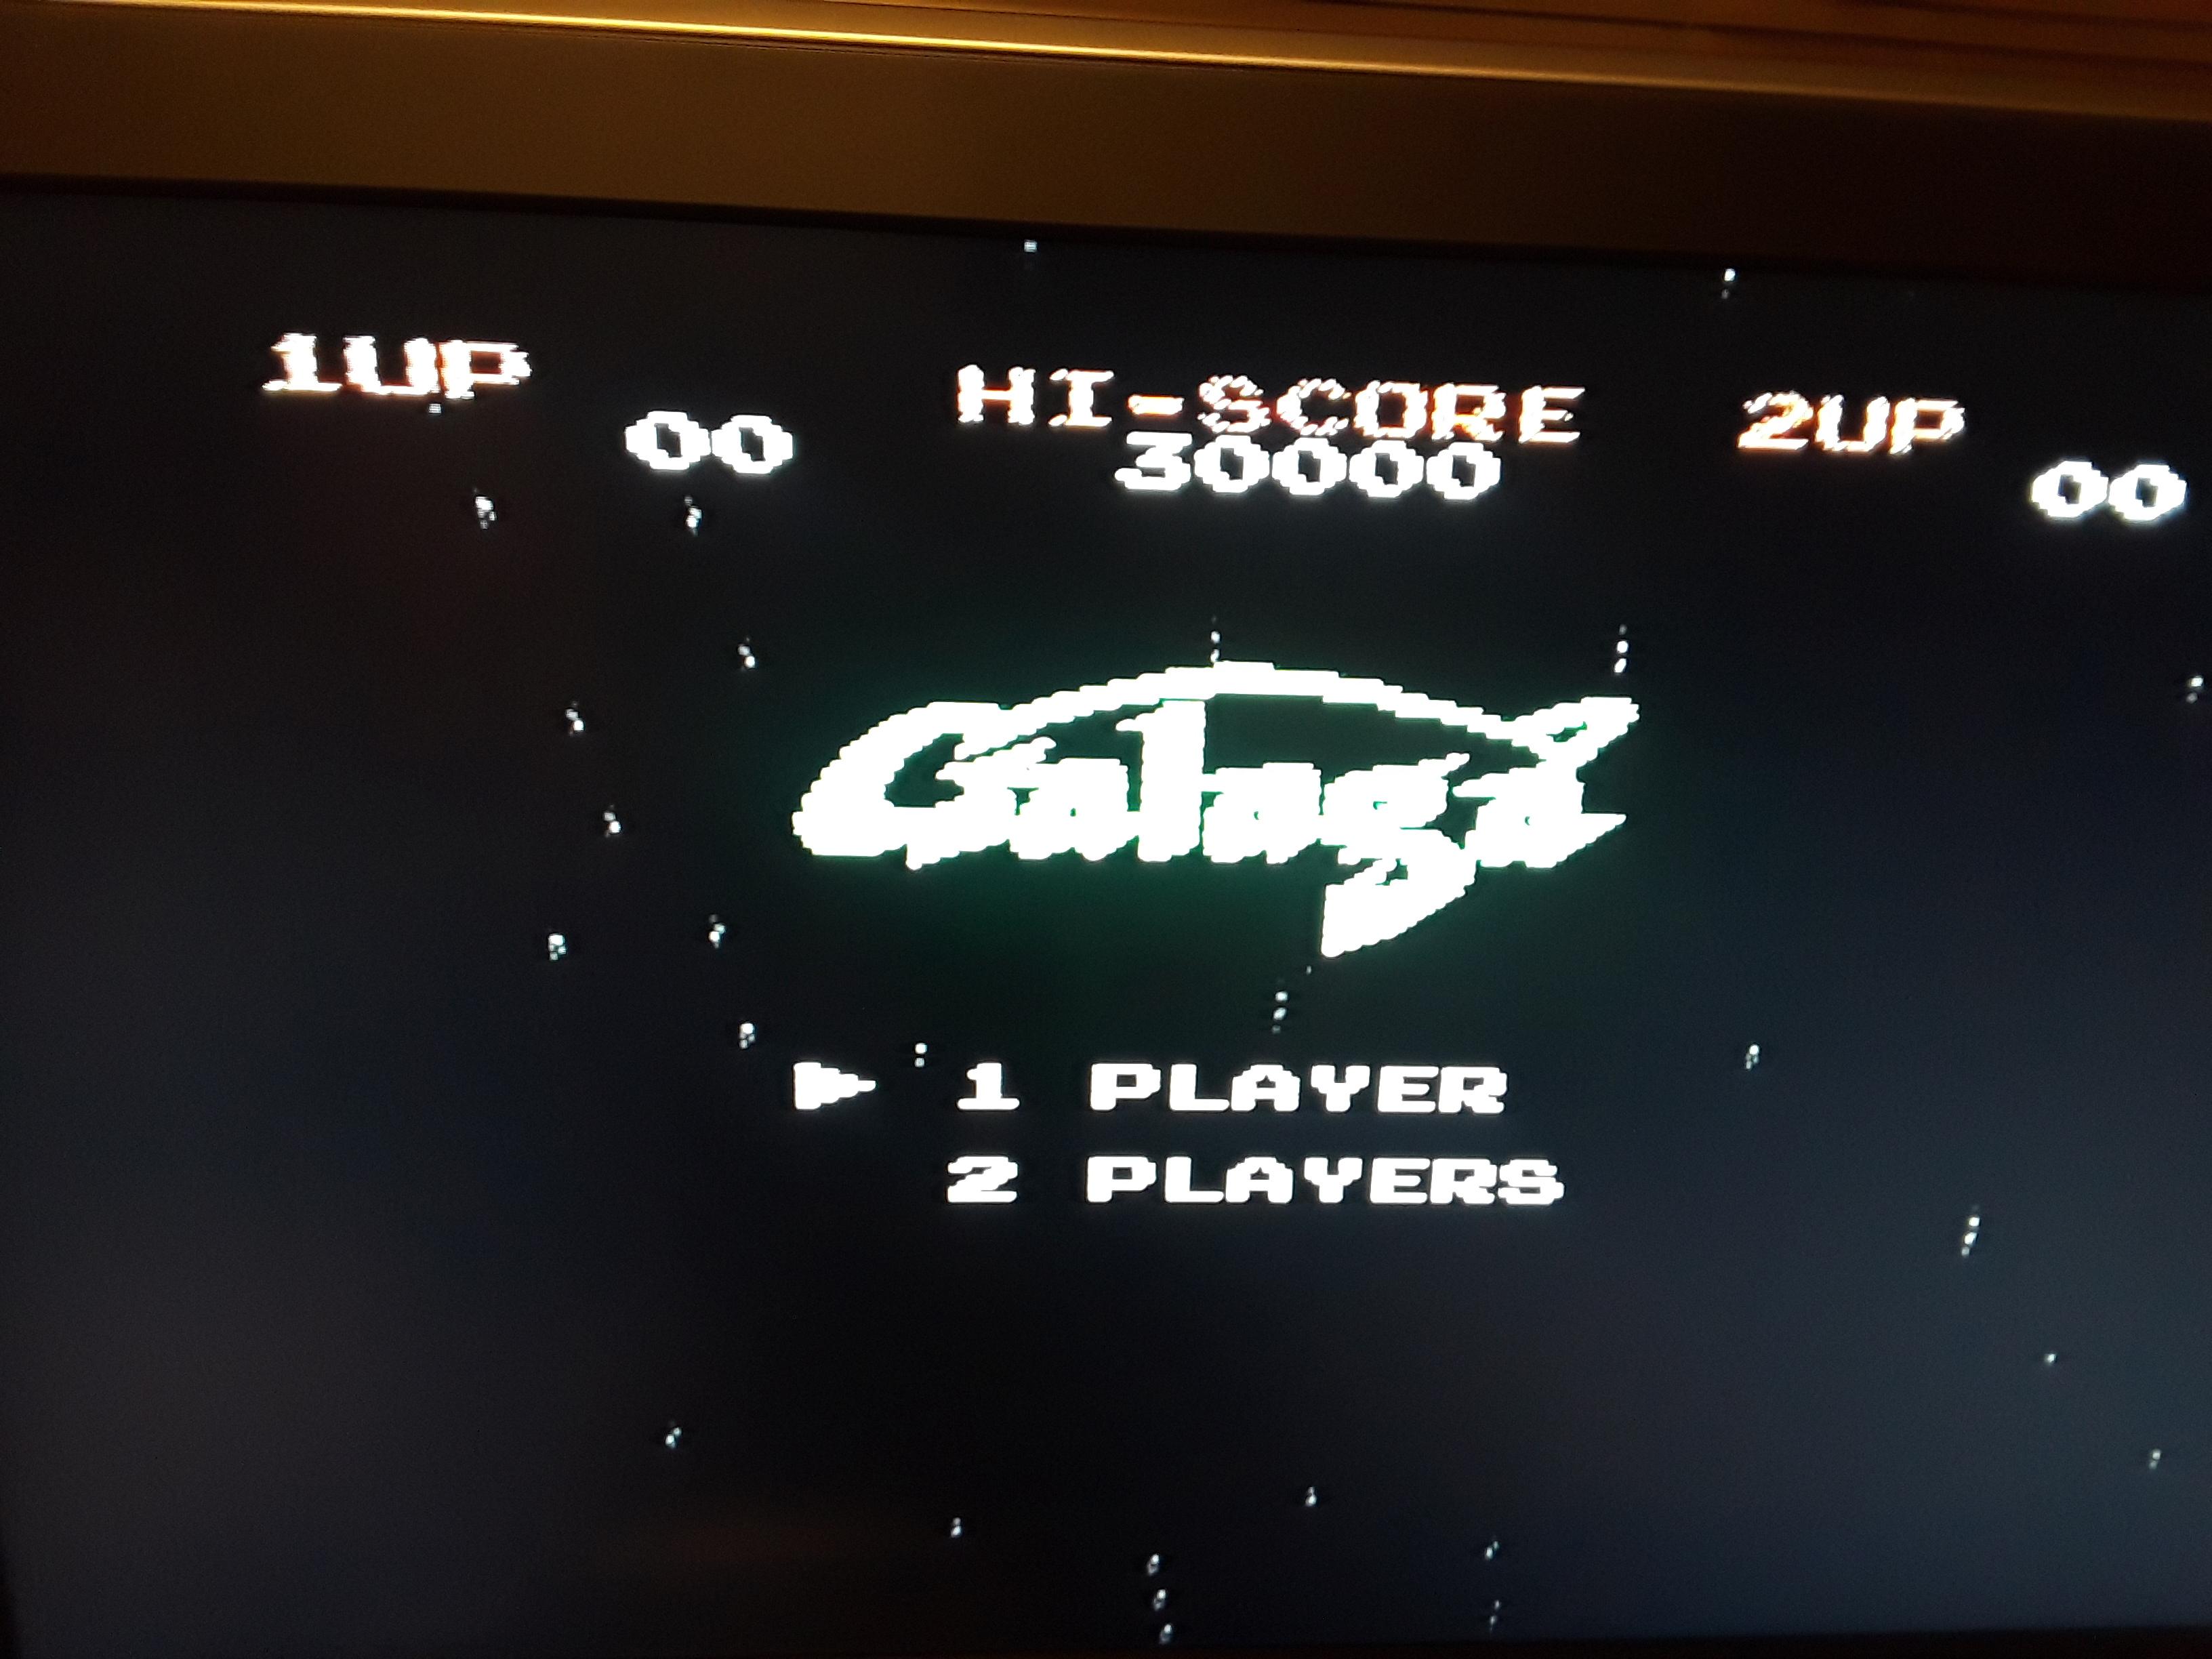 Galaga 22,450 points